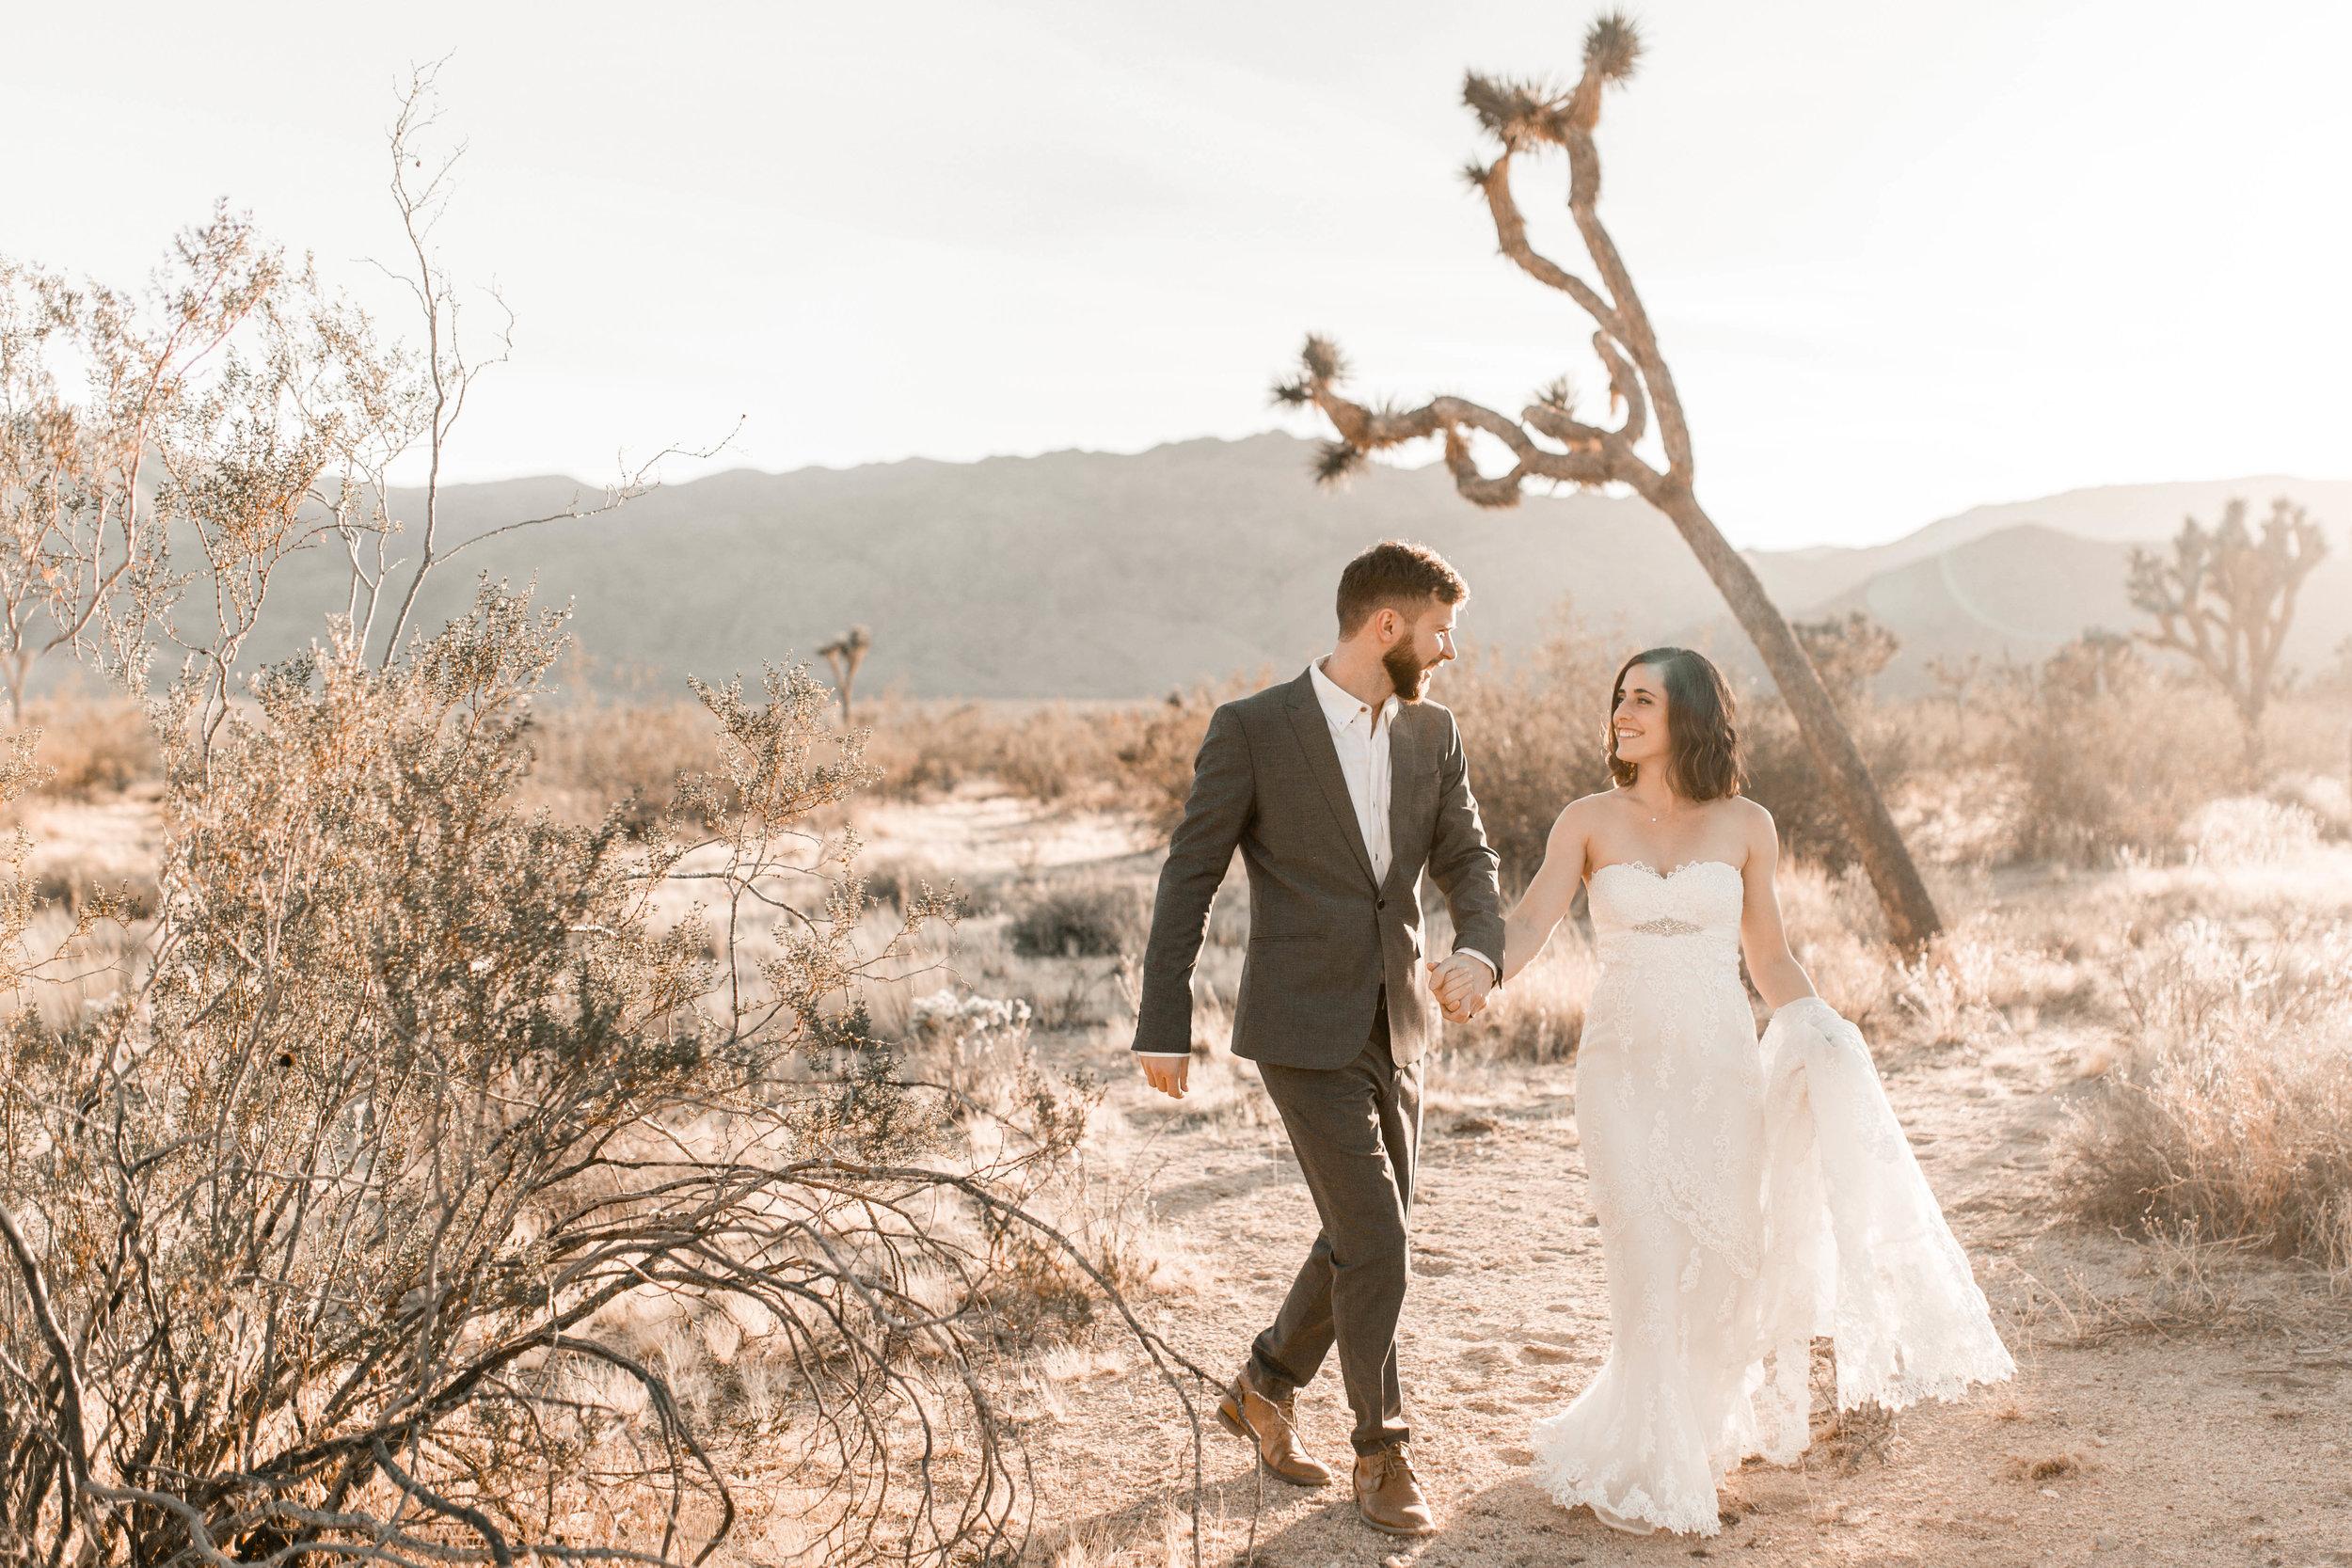 nicole-daacke-photography-joshua-tree-adventurous-elopement-wedding-national-park-wedding-photographer-adventure-wedding-adventurous-elopement-jtree-joshua-tree-national-park-wedding-photographer-intimate-weddings-golden-desert-love-17.jpg